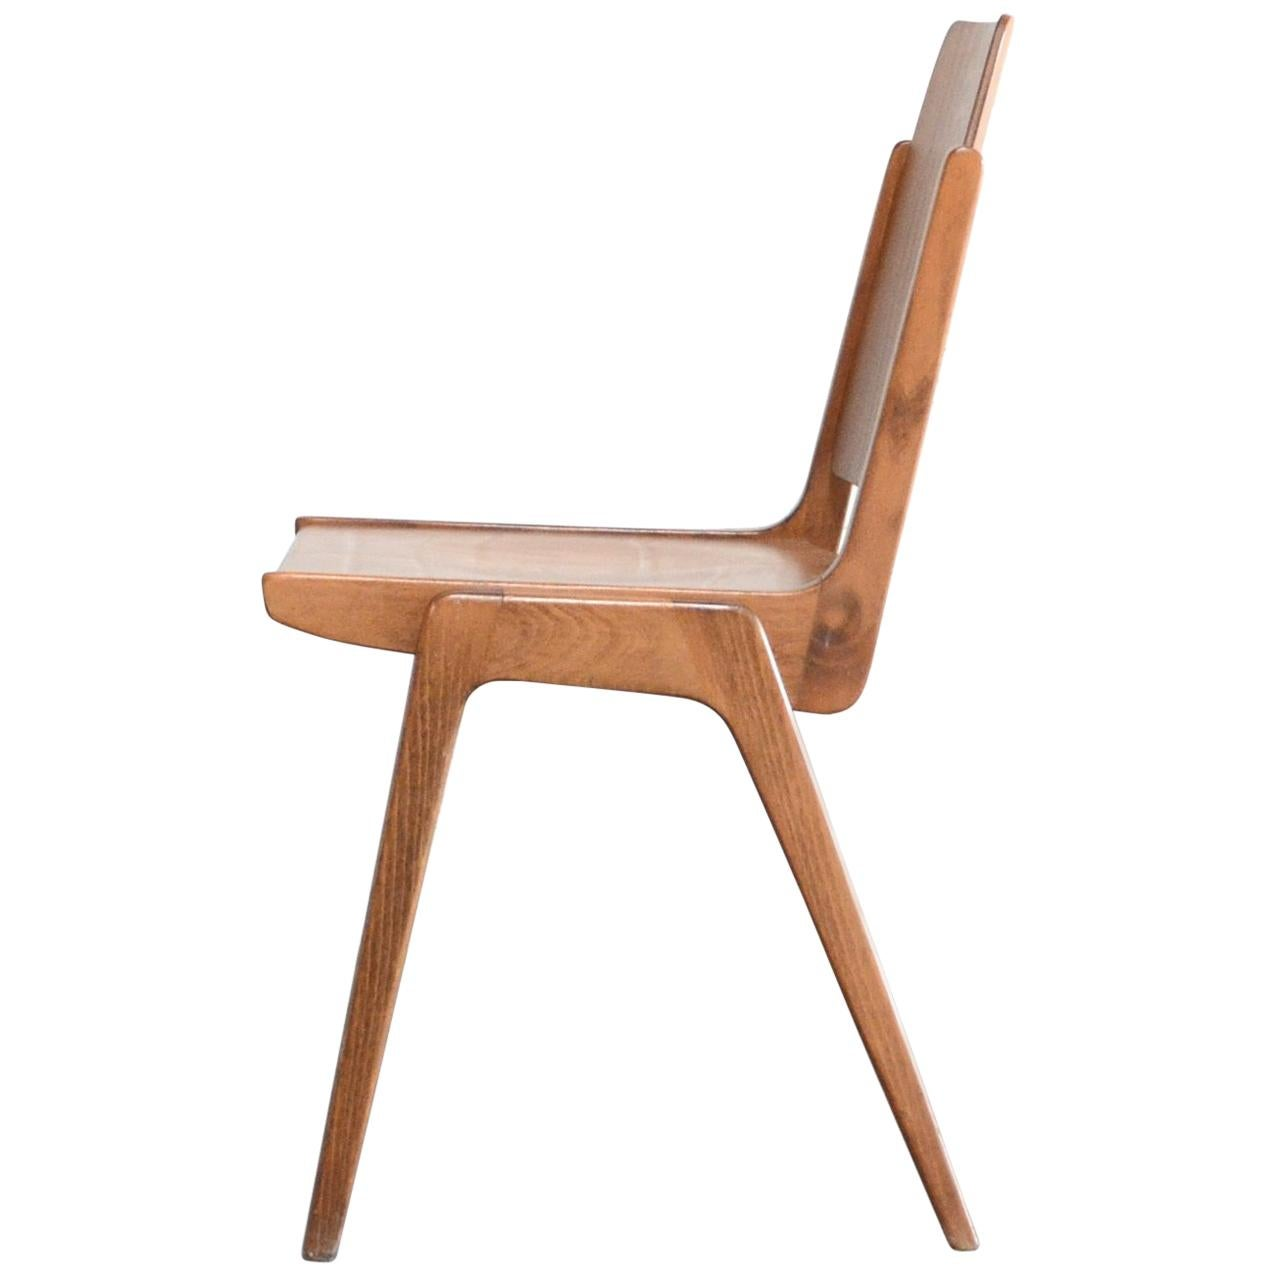 8 Set of Original Austro Chairs by Franz Schuster for Wiesner Hager Austria 1959